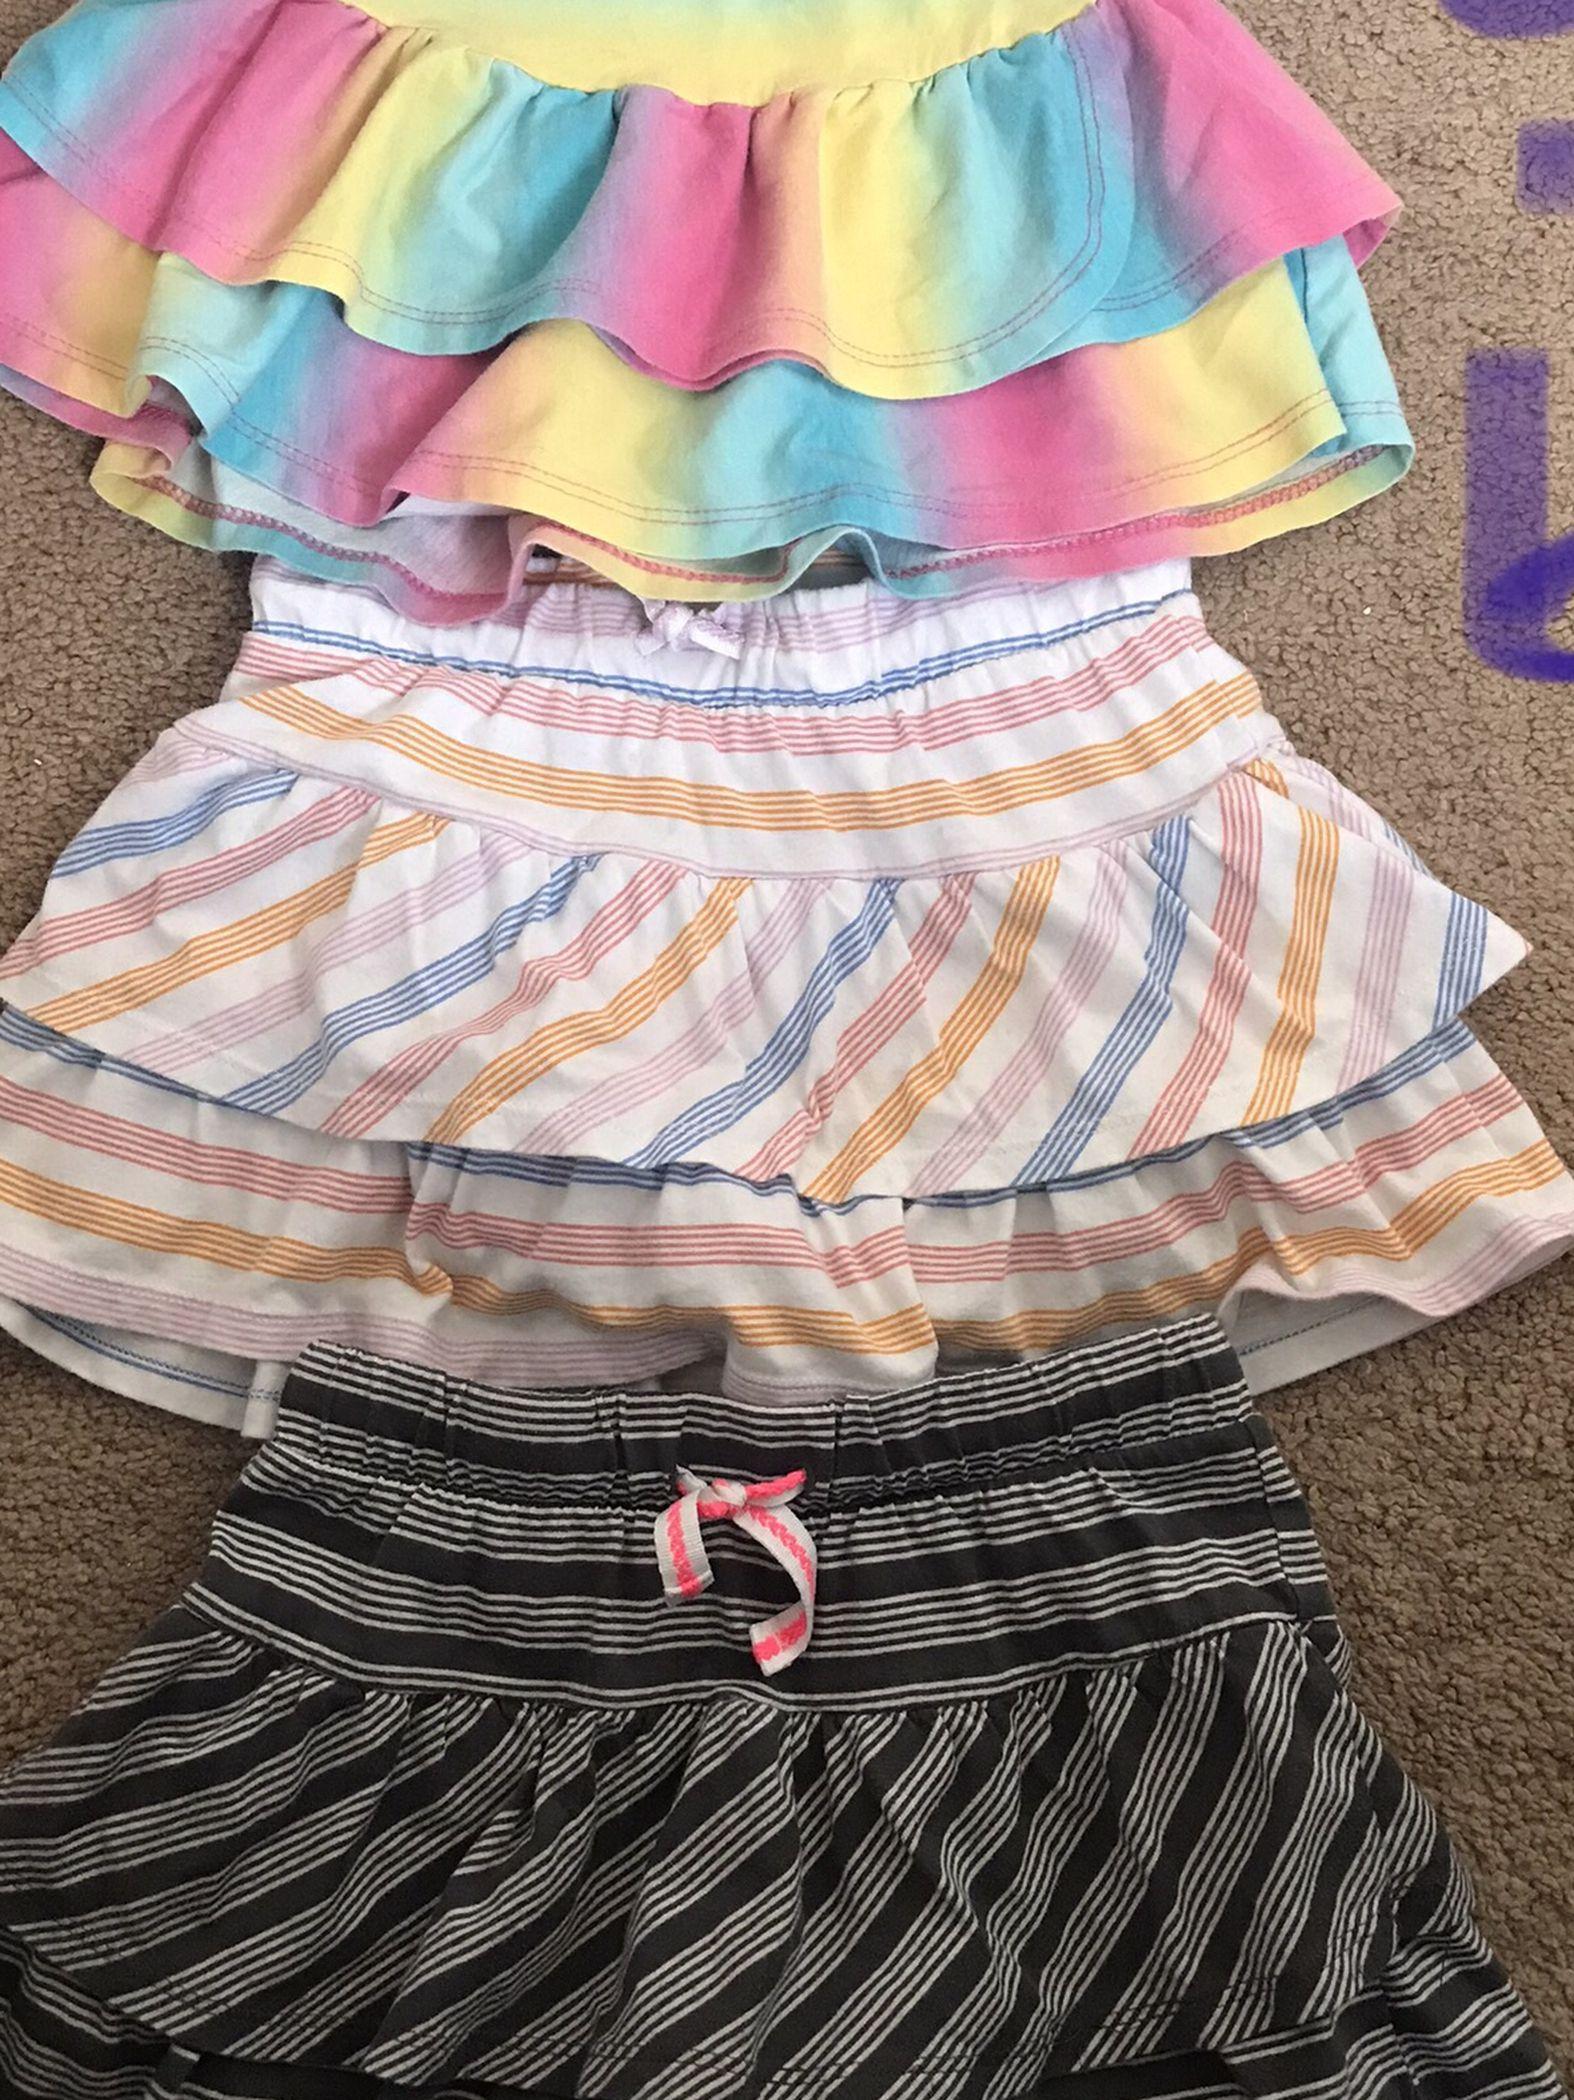 Girls Skirts And Shirts